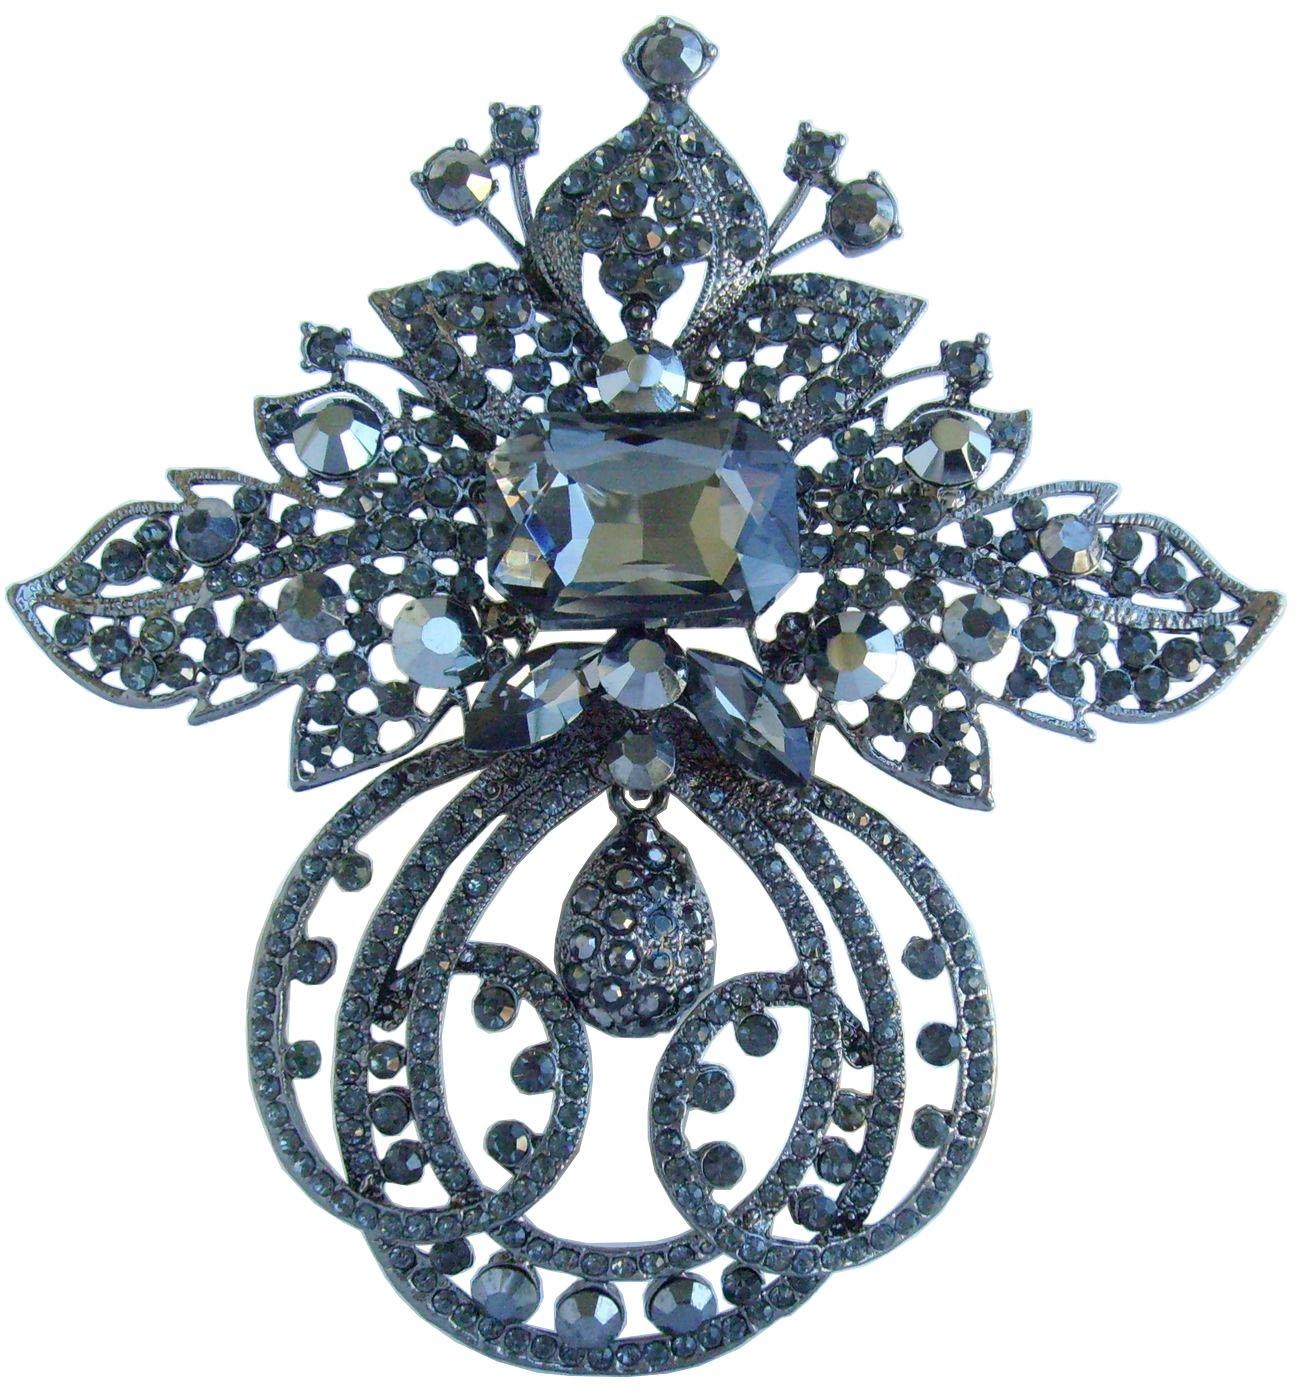 Sindary Jewelry Gorgeous 4.72'' Rhinestone Crystal Flower Brooch Pin Pendant BZ4249 (Black-Tone Black Gray)